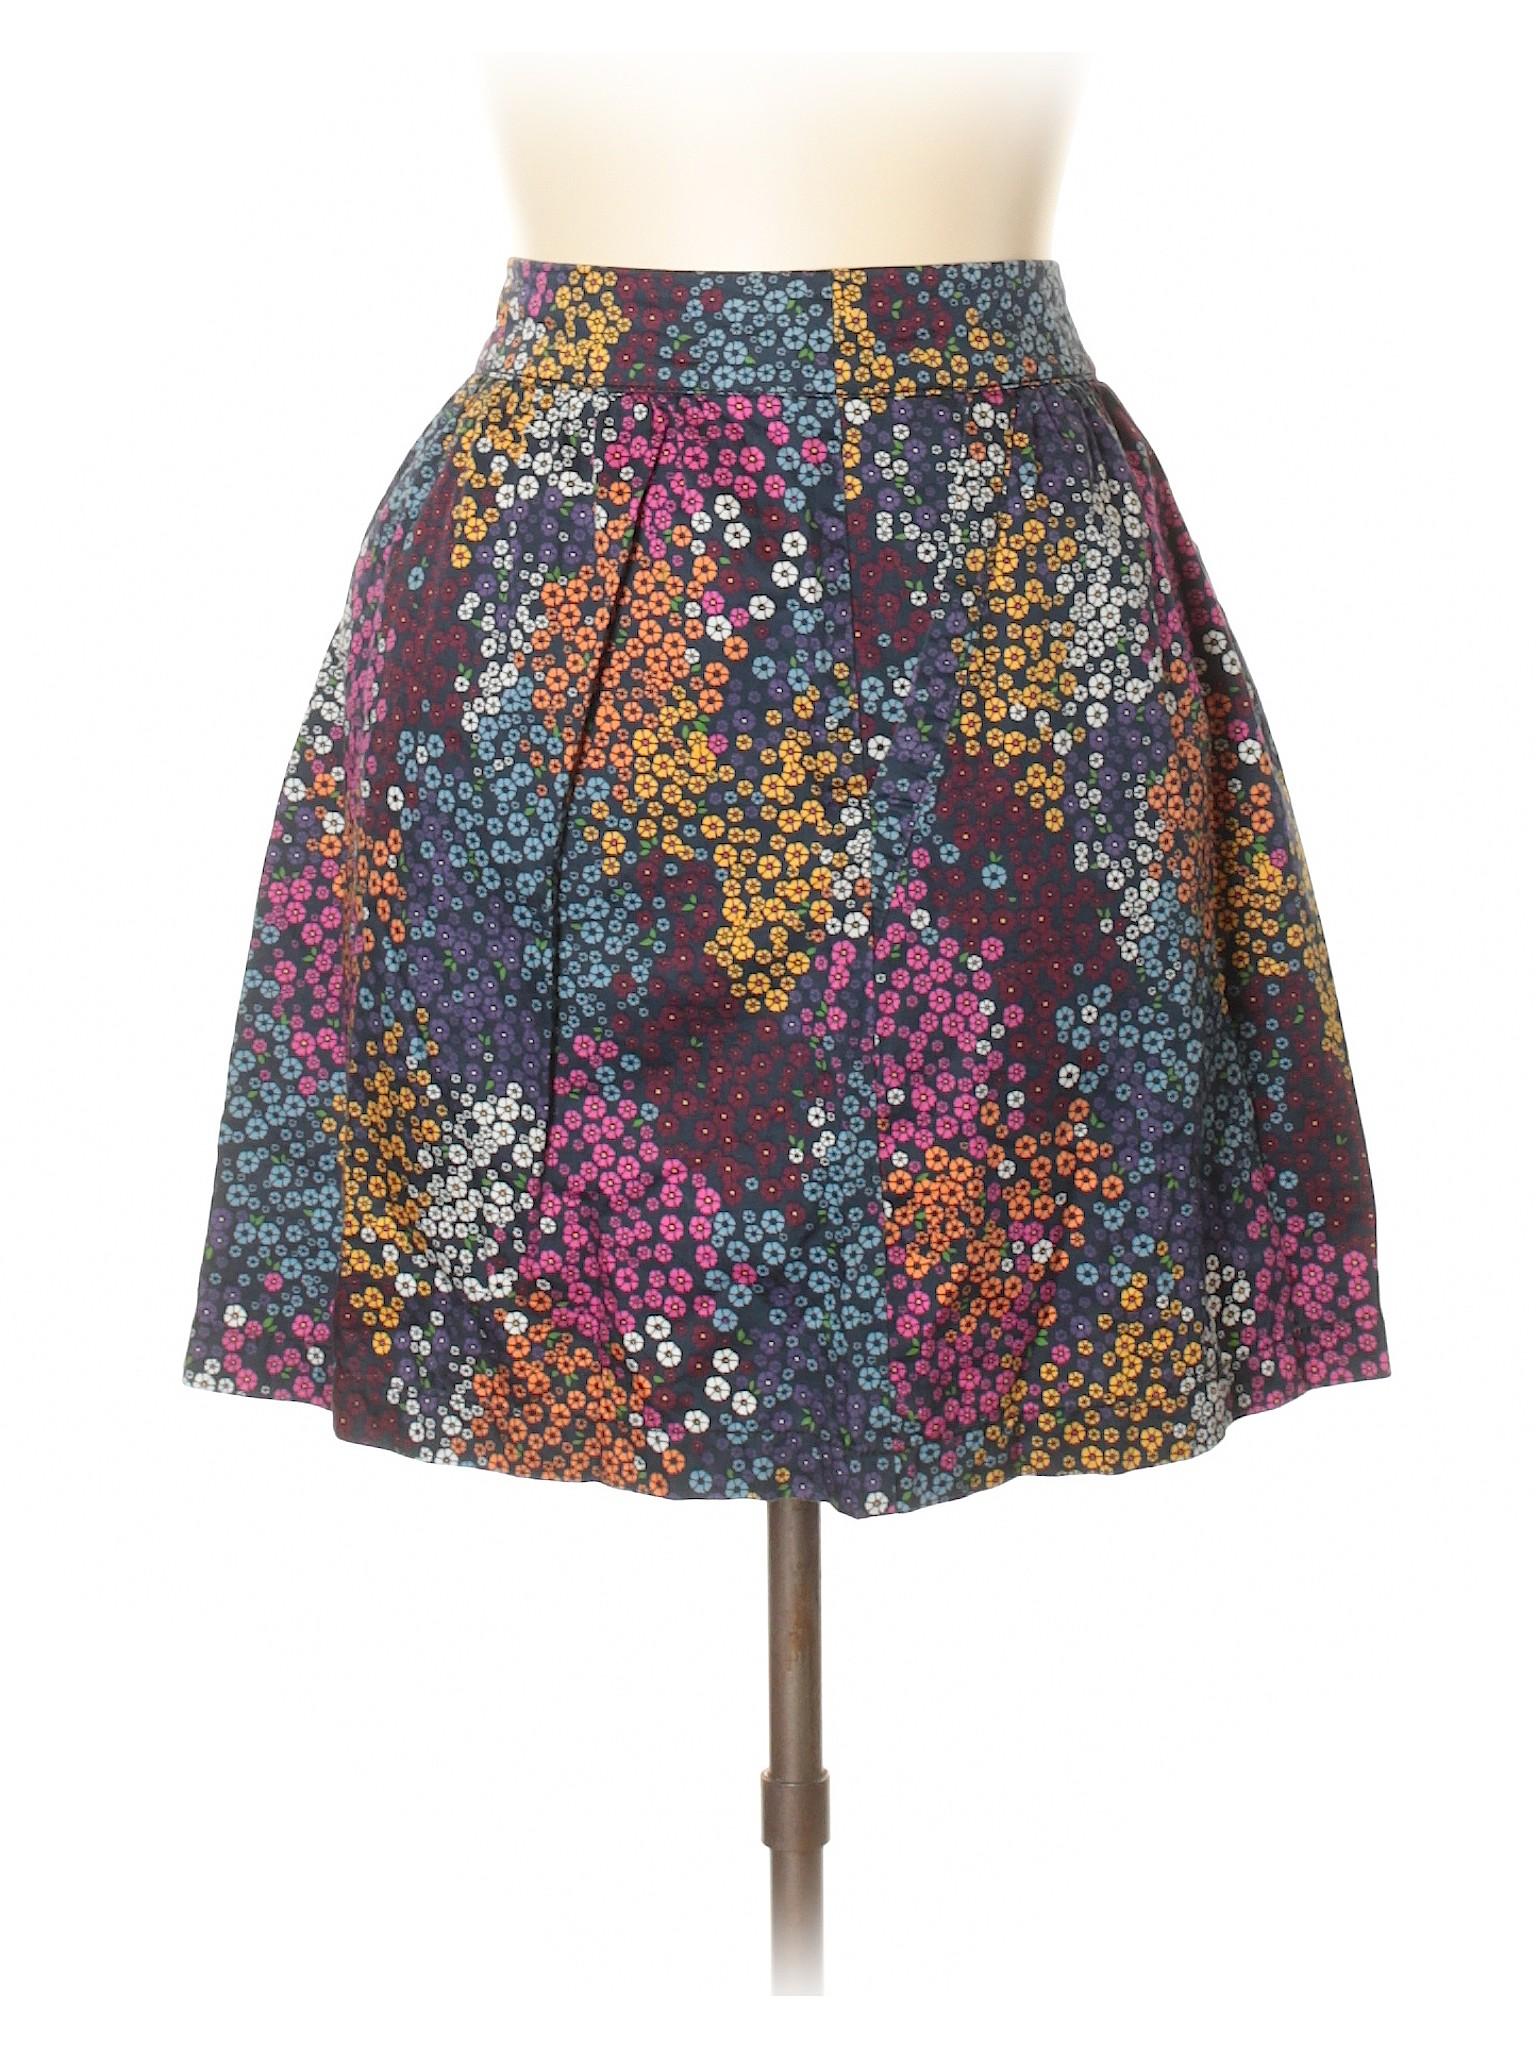 Skirt Casual Casual Boutique Skirt Skirt Boutique Casual Boutique Casual Casual Boutique Boutique Skirt Skirt Casual Boutique vPEqfYq